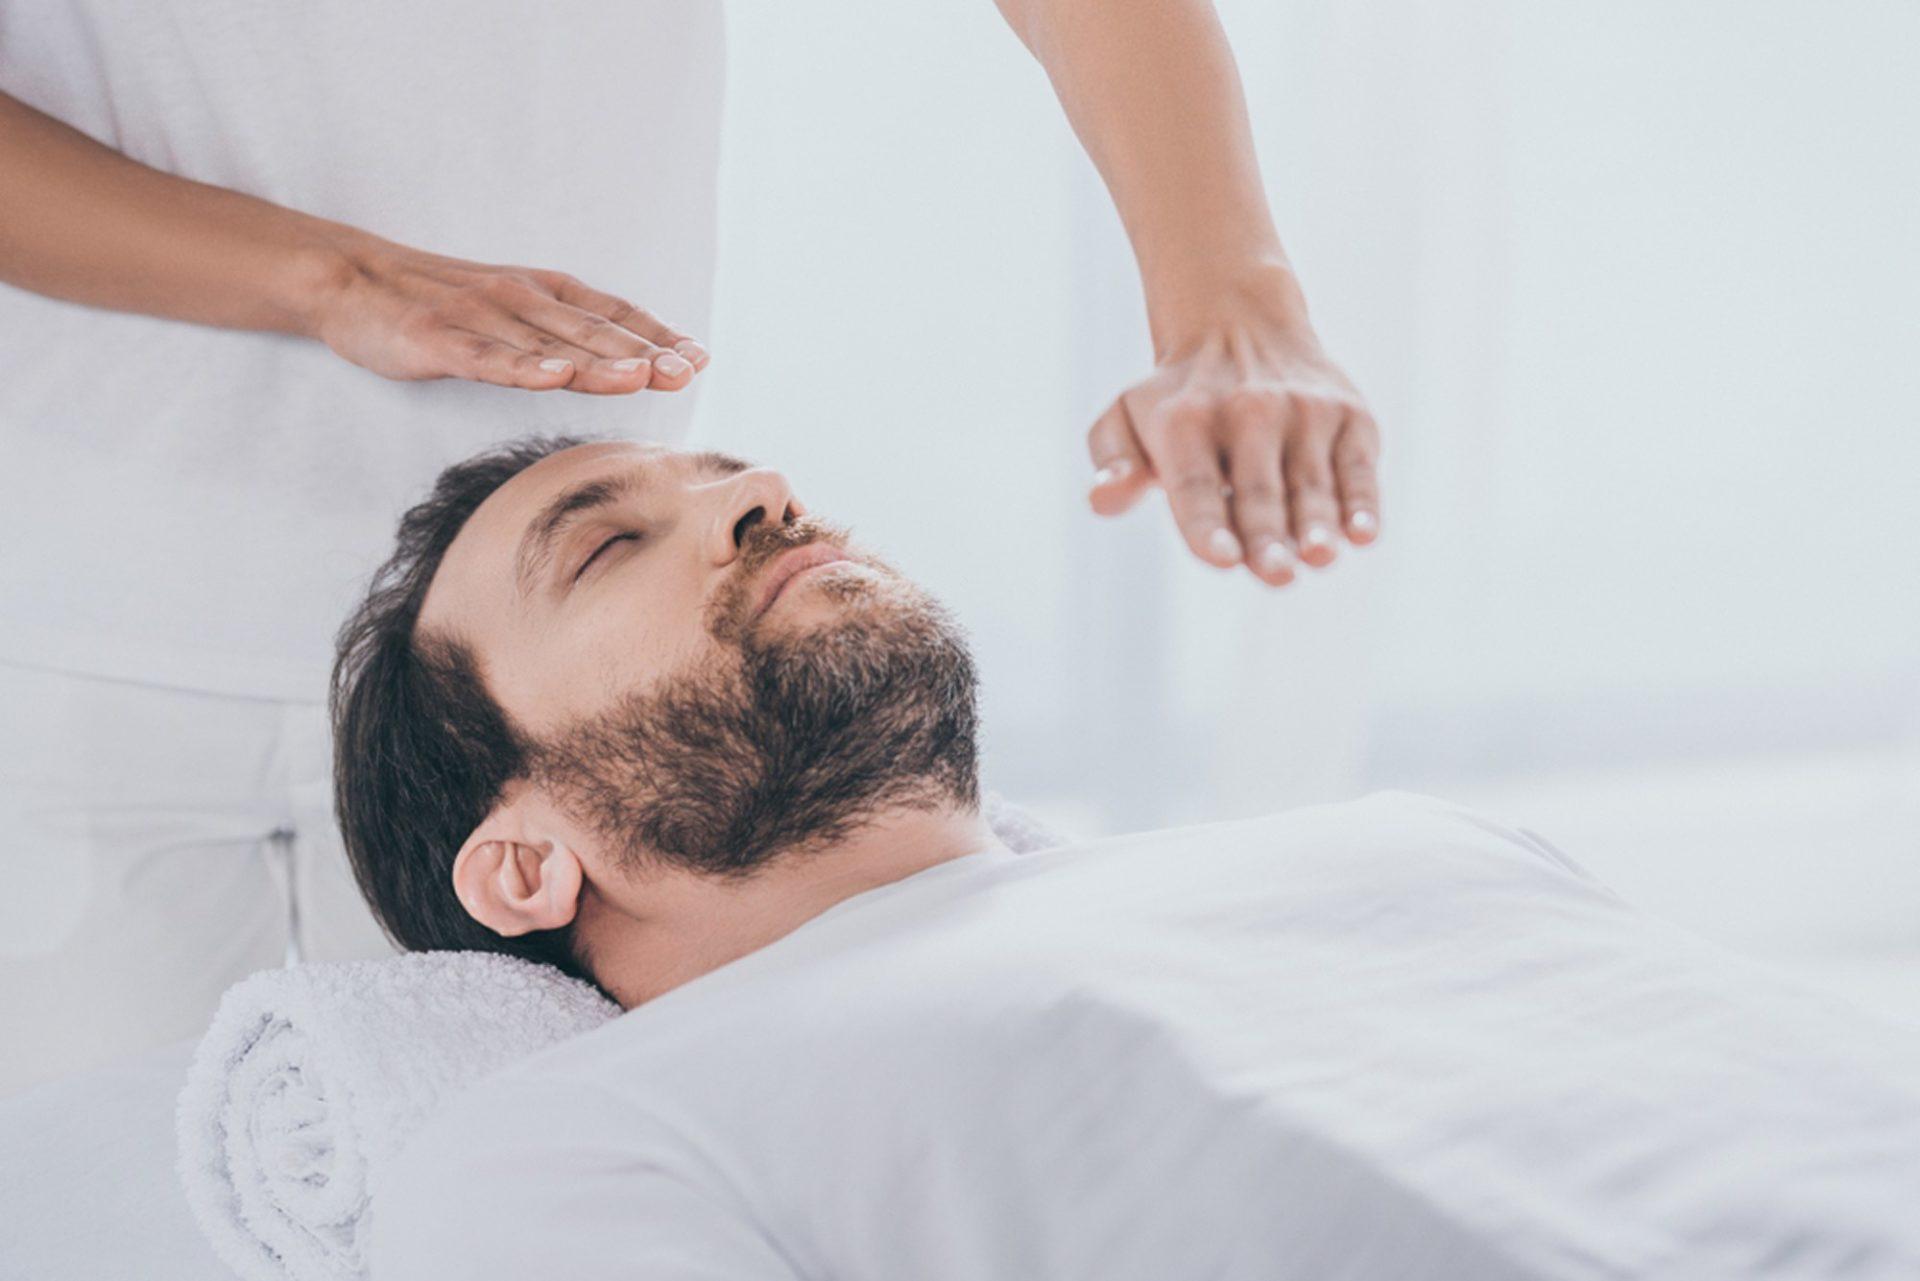 Praticien de Qigong Médical: P1 – Introduction au Qigong Médical